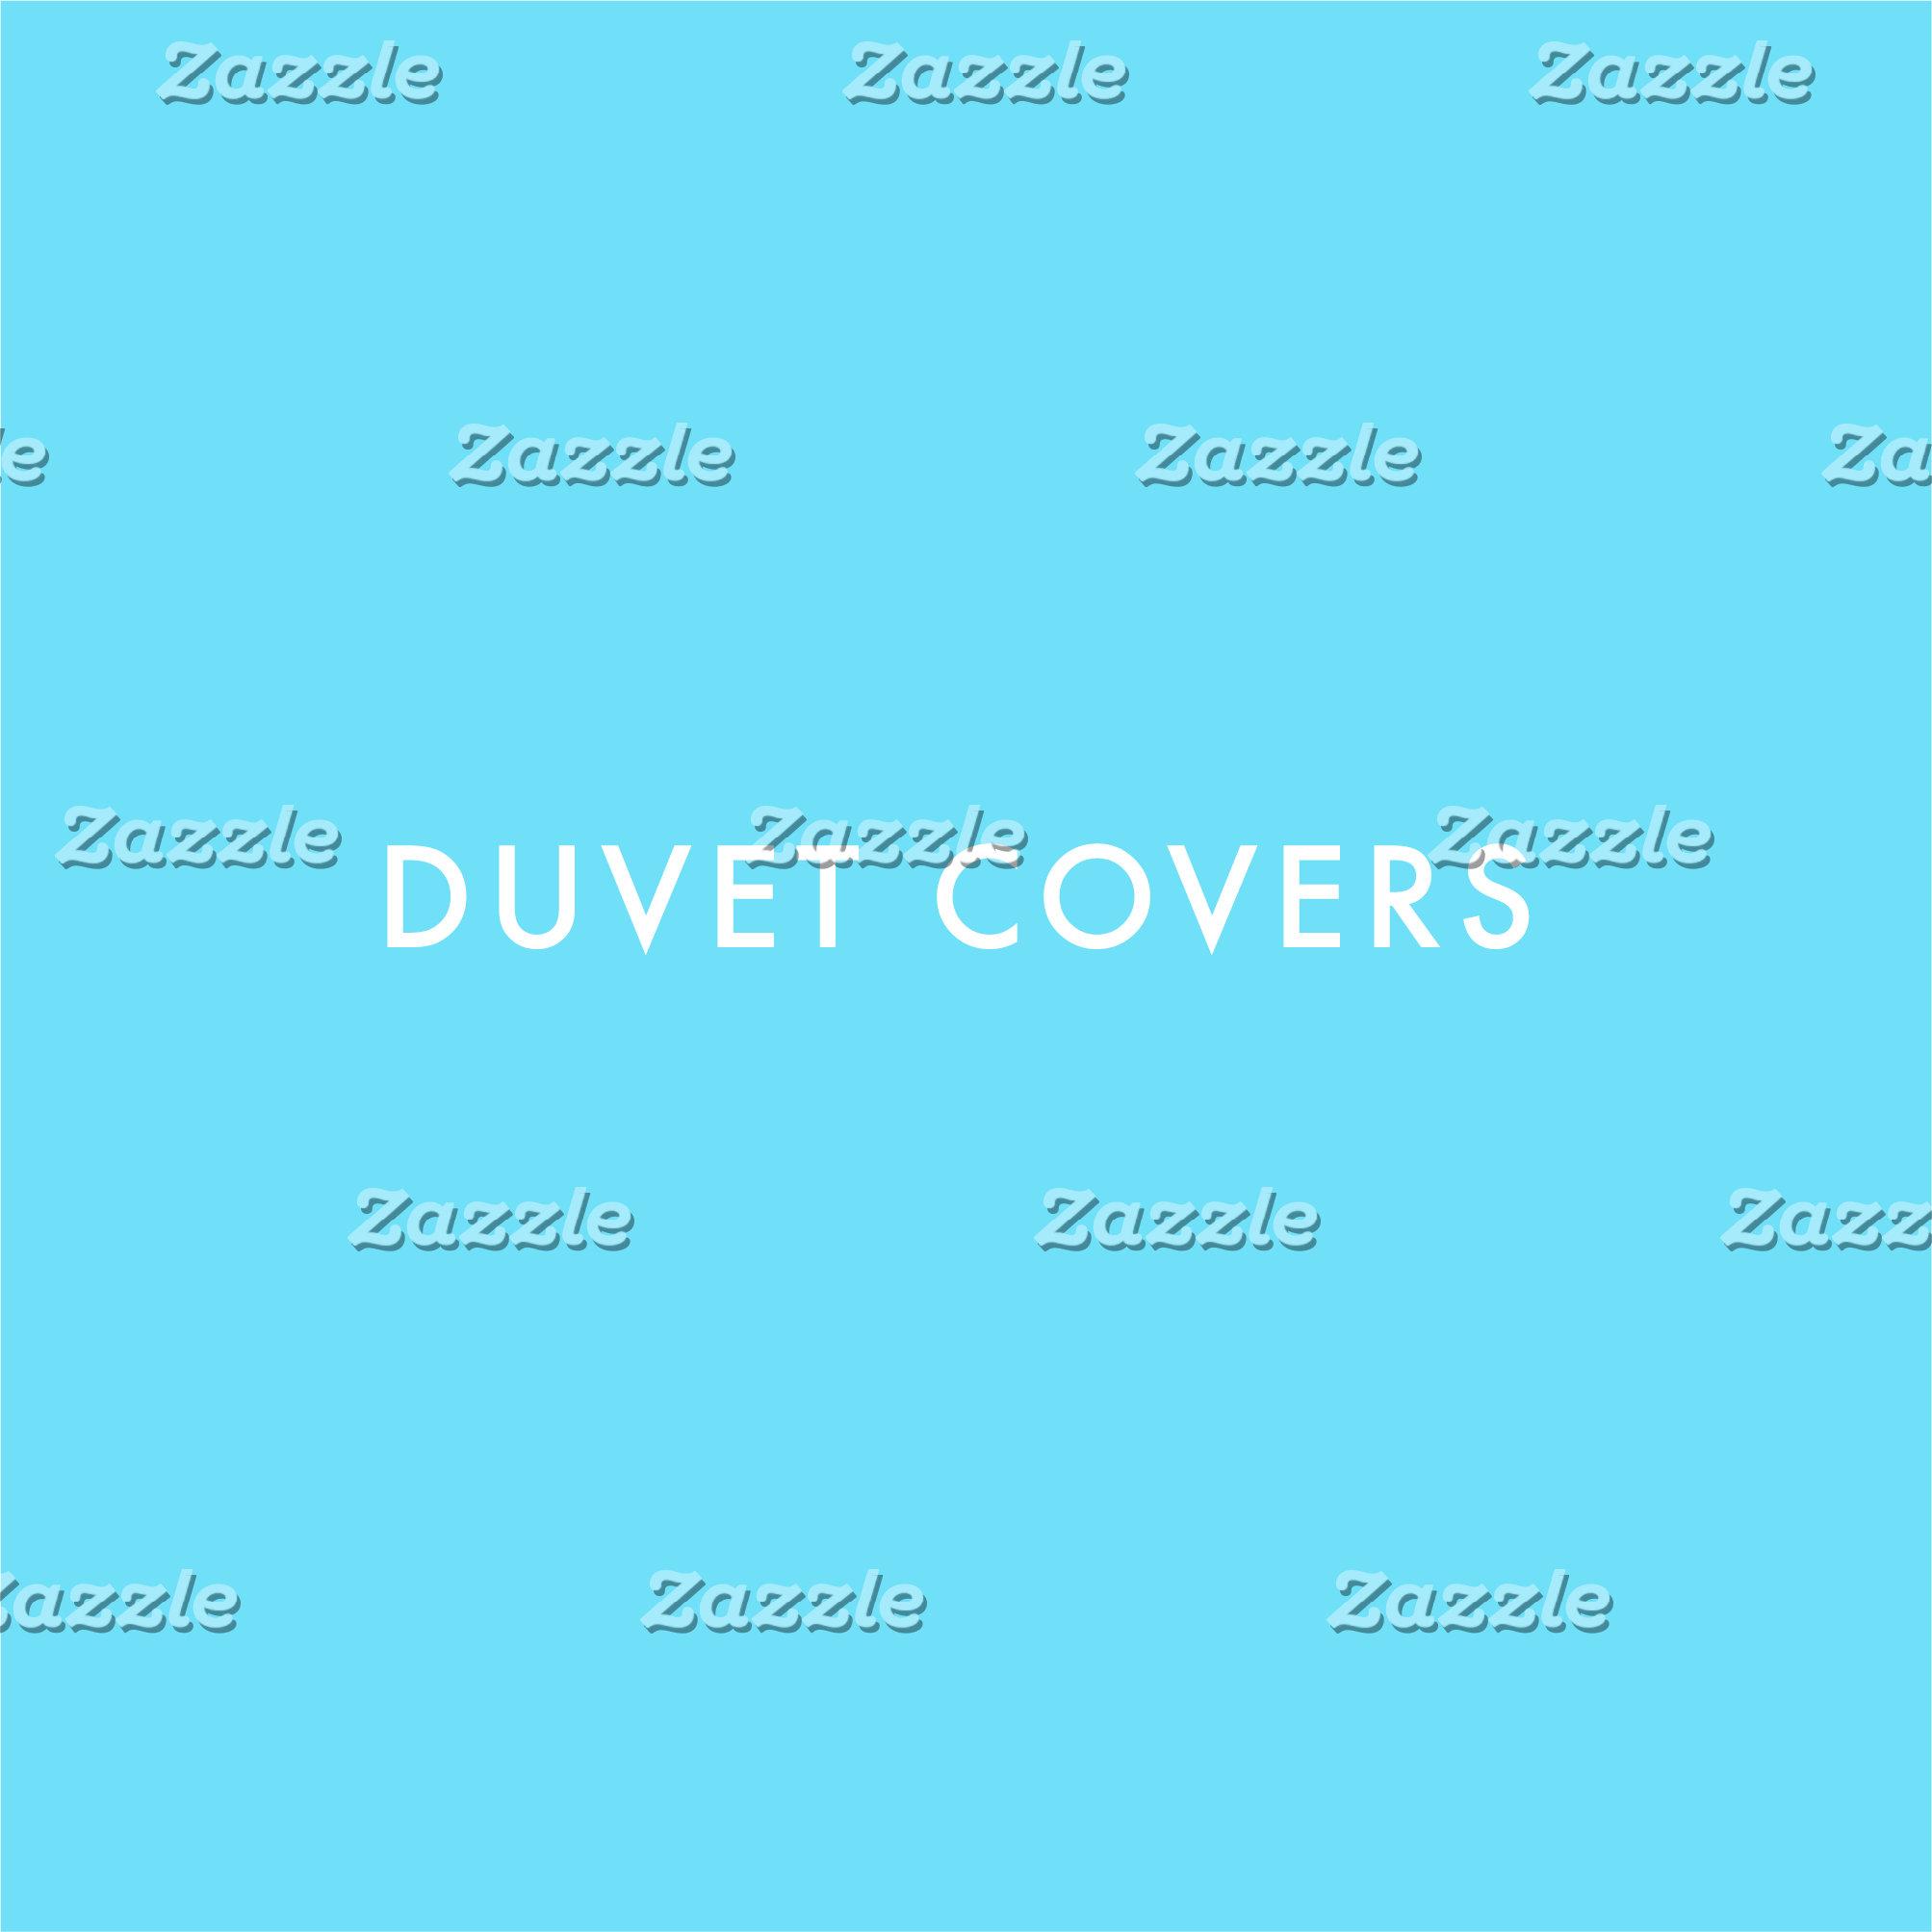 Duvets